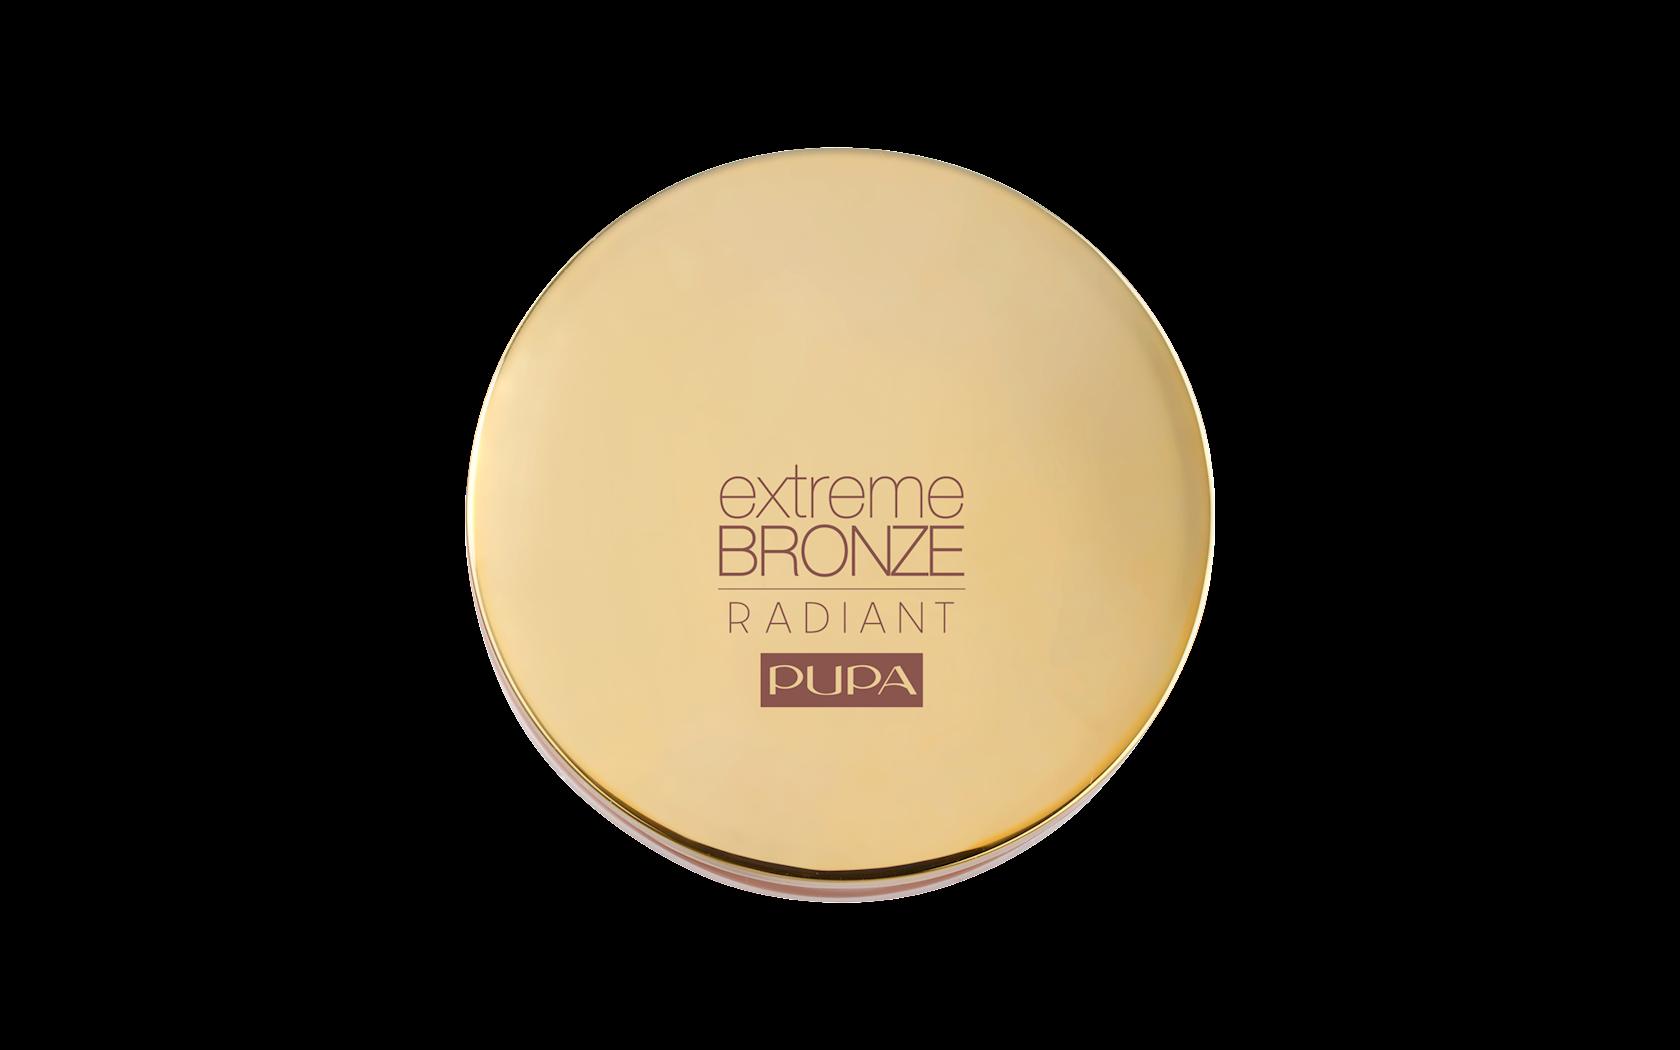 Bronzlaşdırıcı kirşan Extreme Bronze Radiant №010 Biscuit